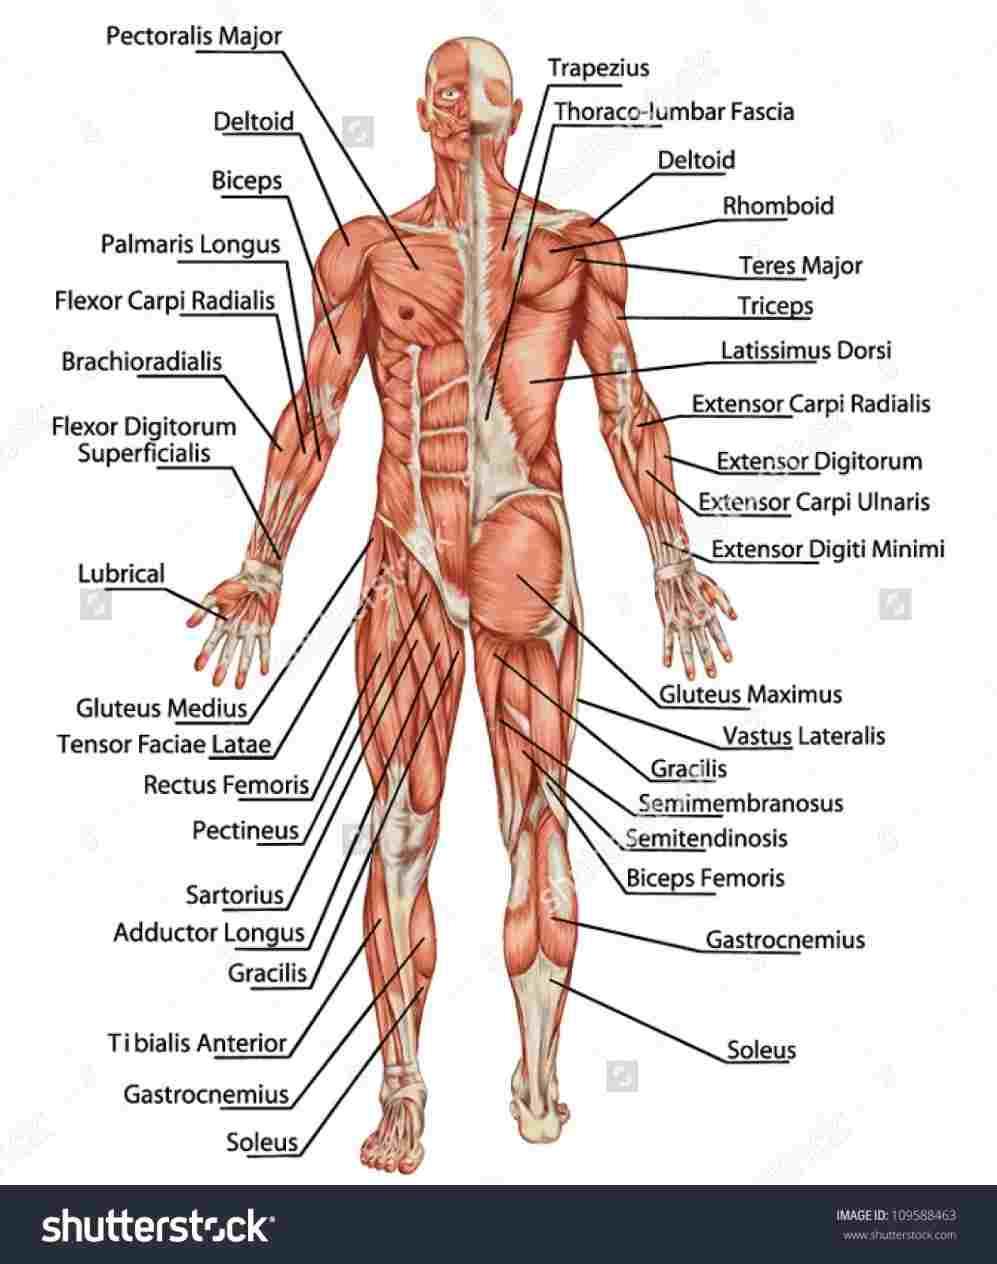 Diagram Of Human Body Organs Chart Upper Body Anatomy Diagram Of Upper Body Organs Human